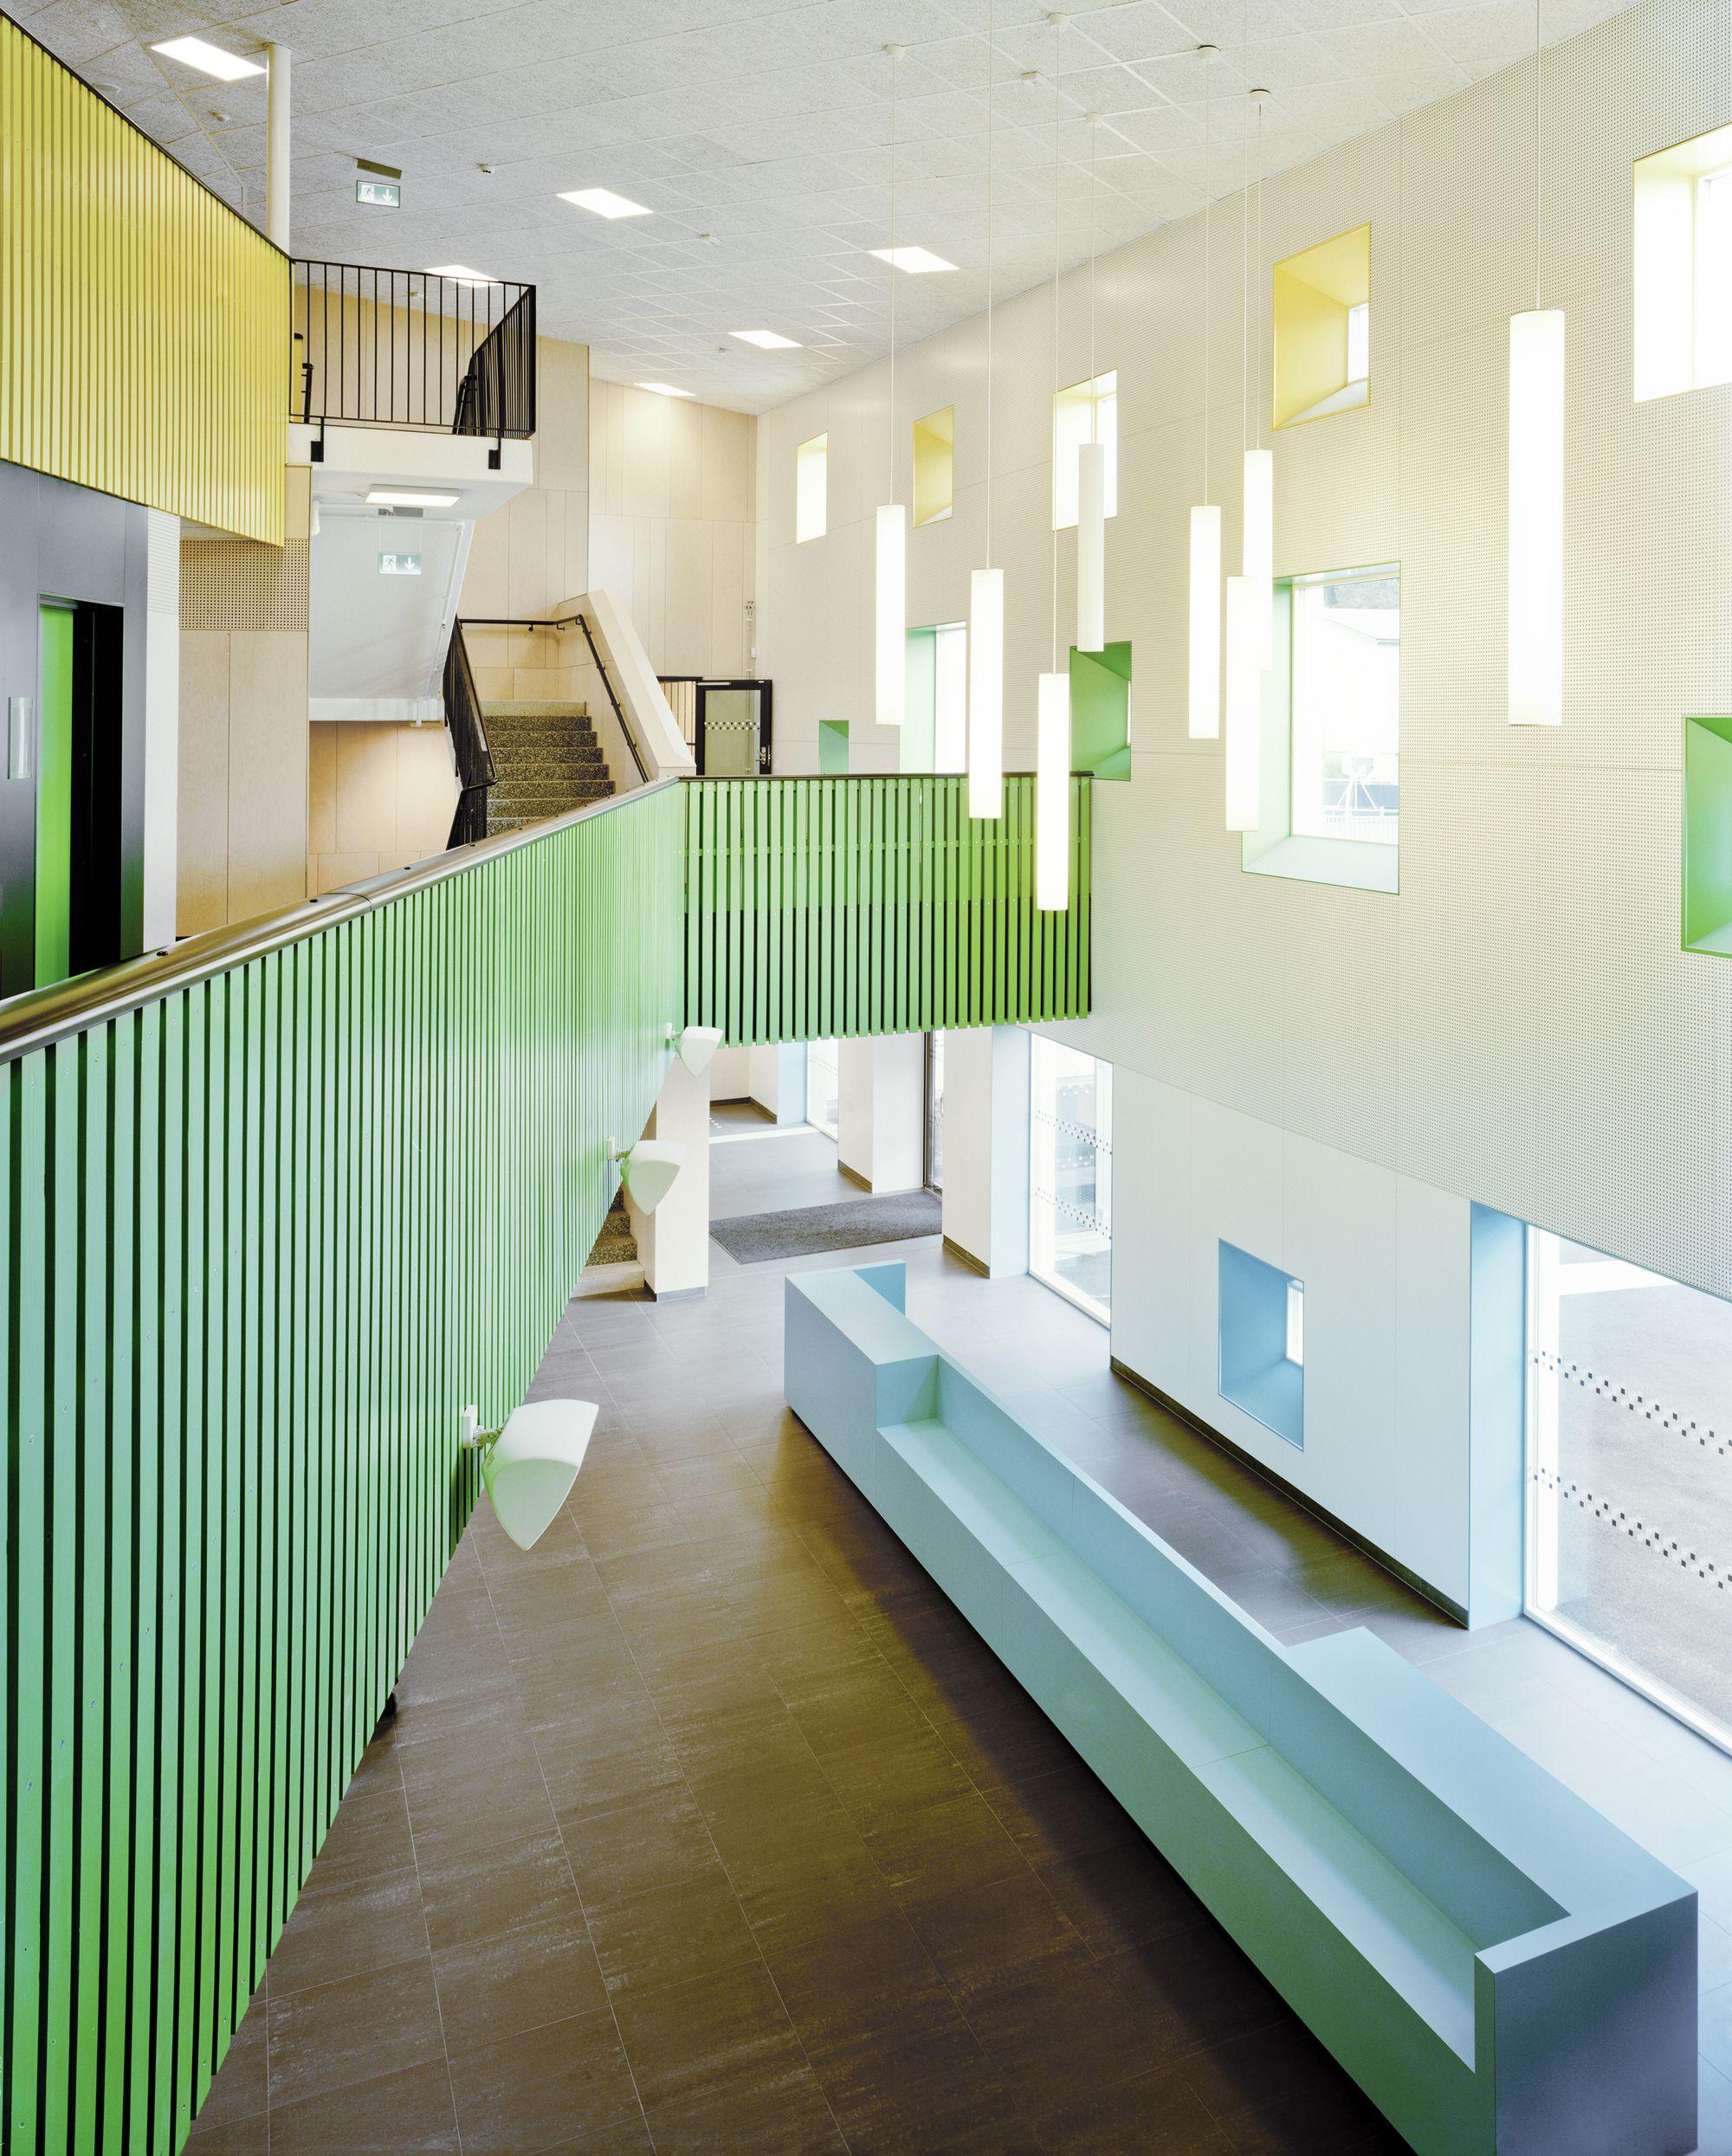 School Interior Design: Gallery Of Kollaskolan School / Kjellgren Kaminsky